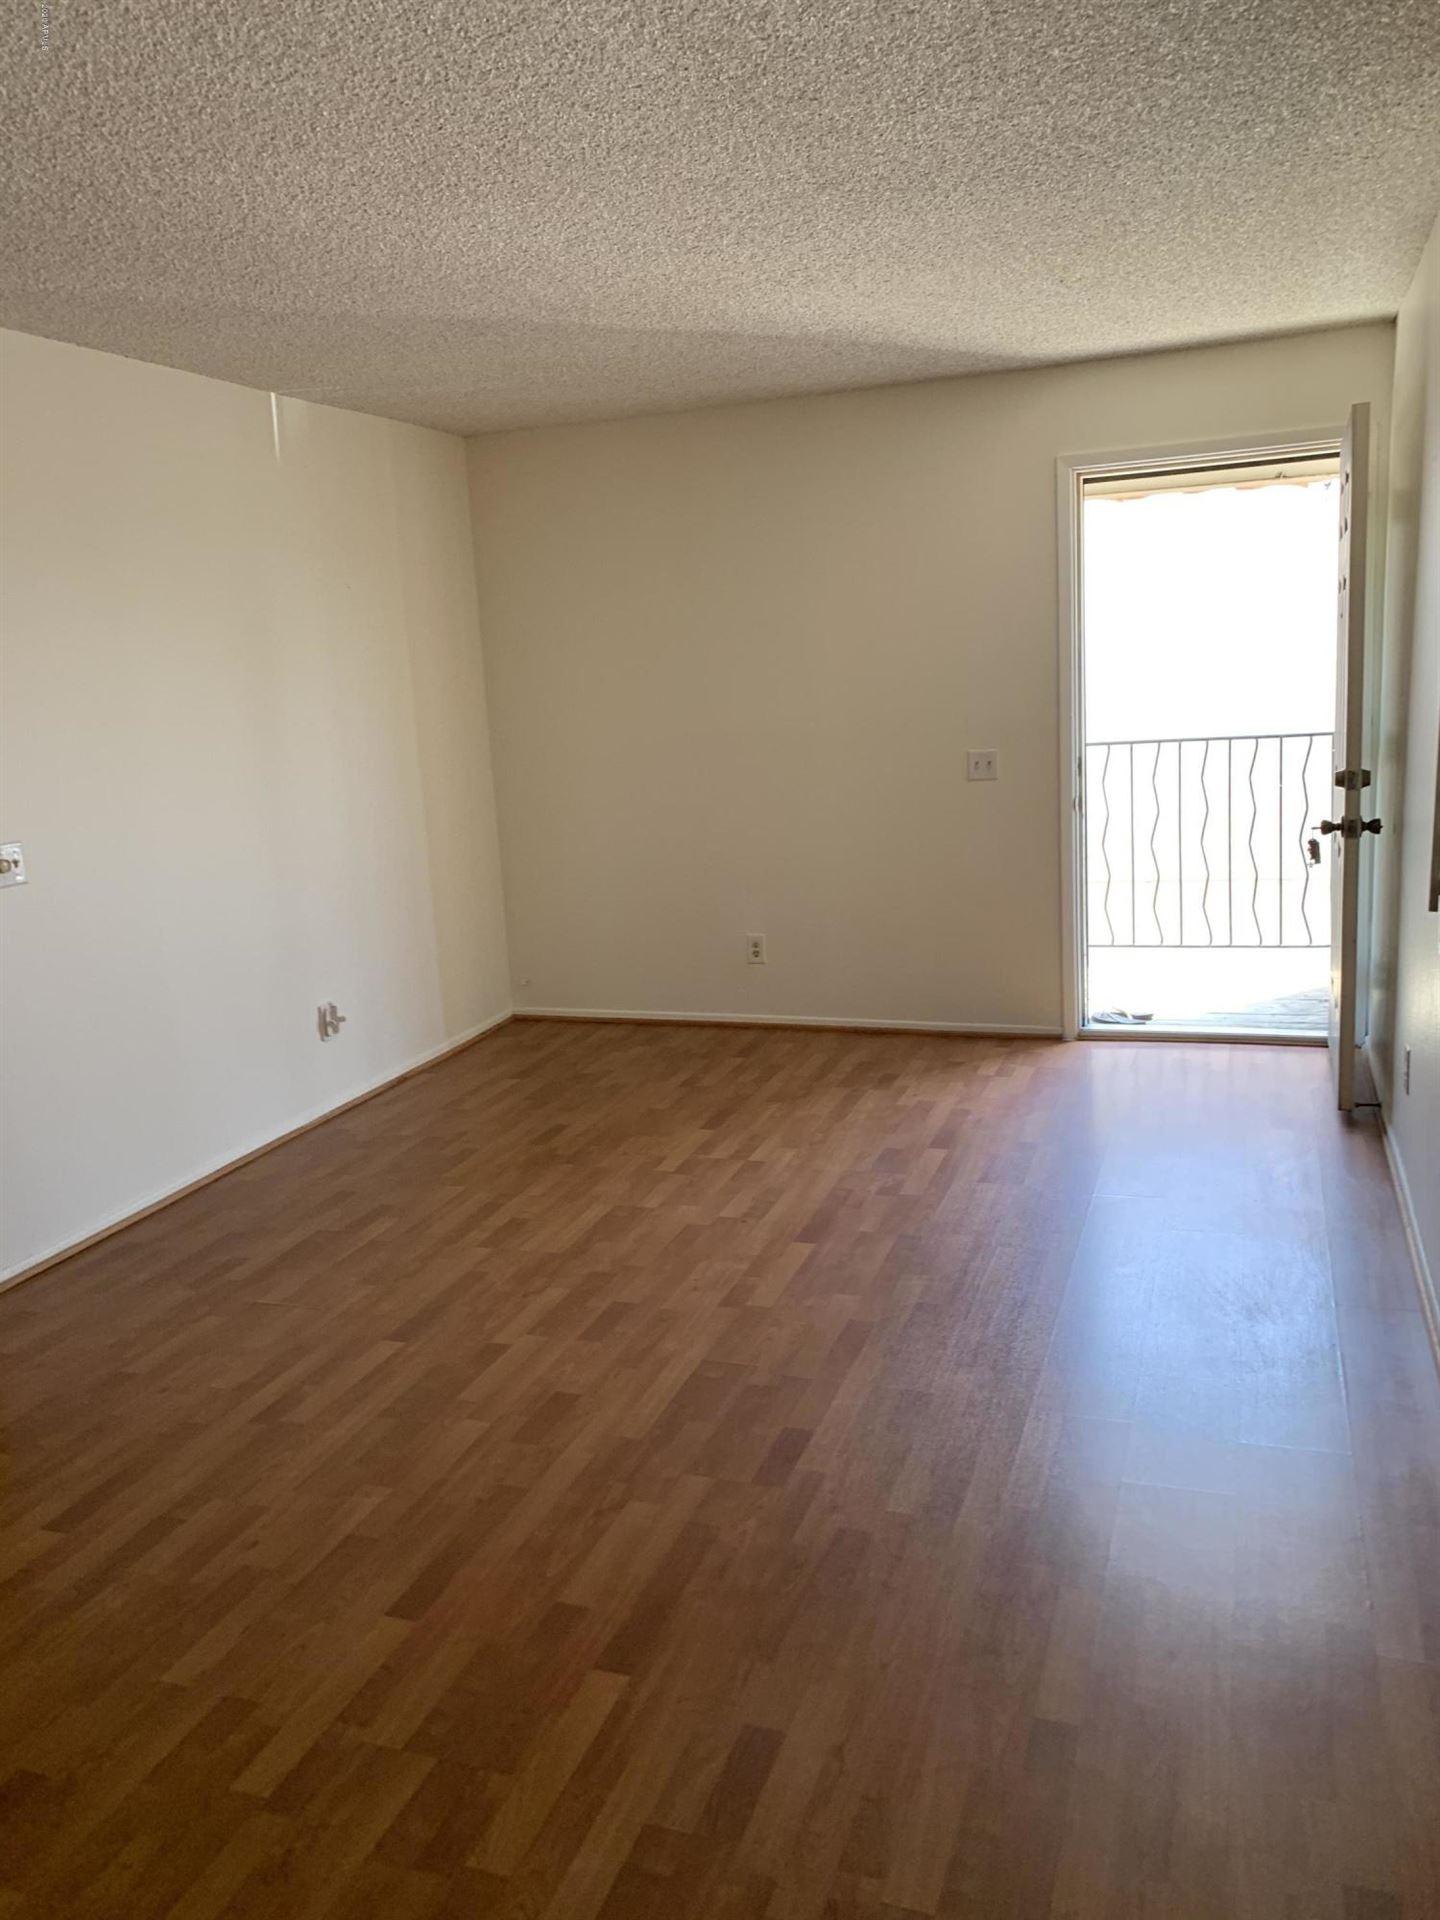 Photo of 1255 N 47TH Place, Phoenix, AZ 85008 (MLS # 6058519)